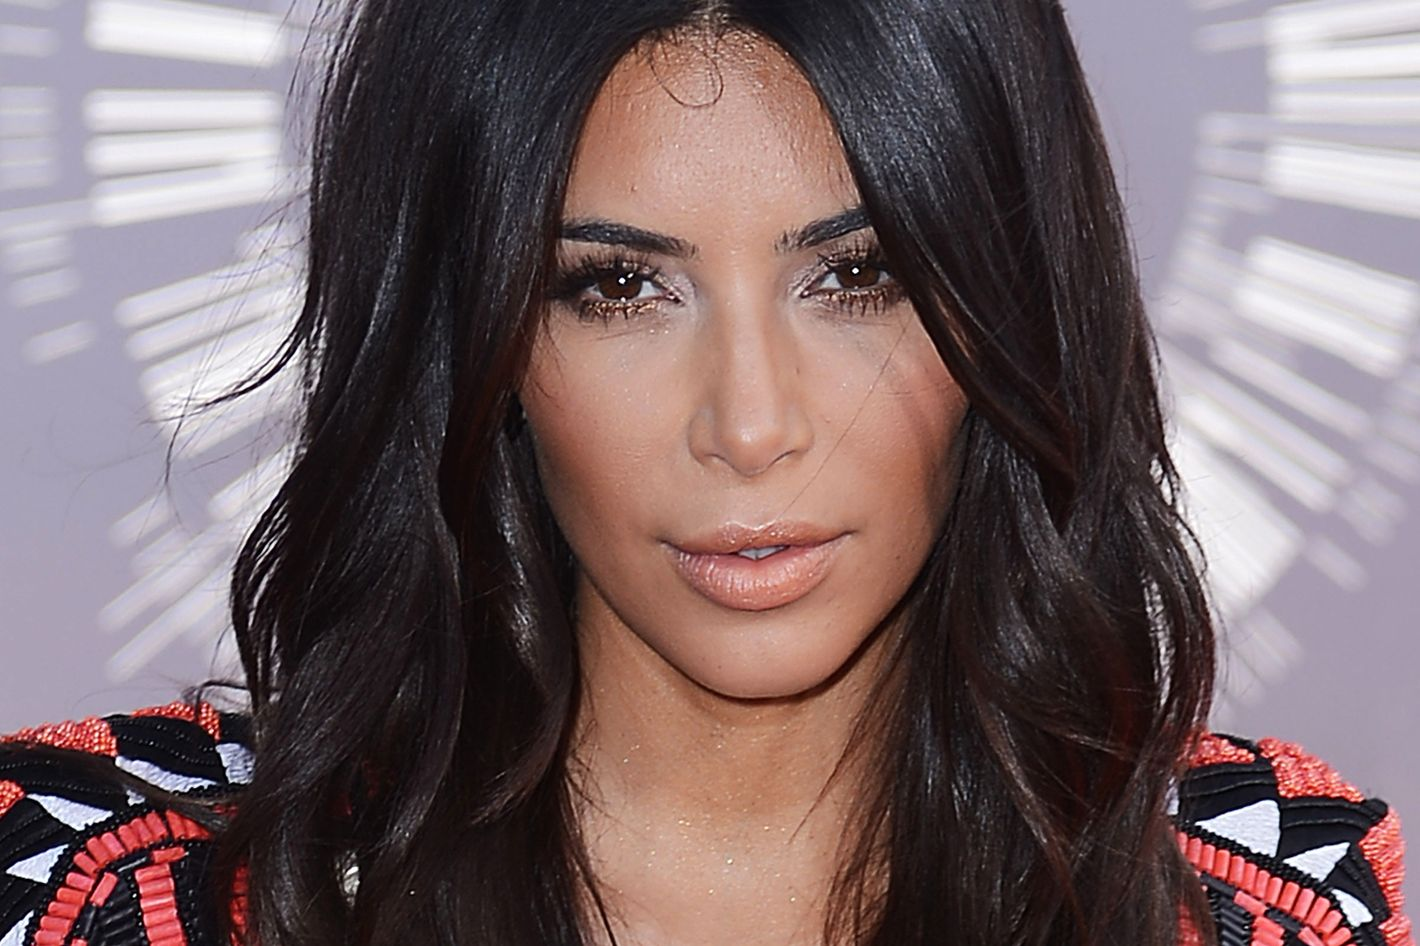 c84d59c9bb011 How to Get Soft Waves Like Kim Kardashian